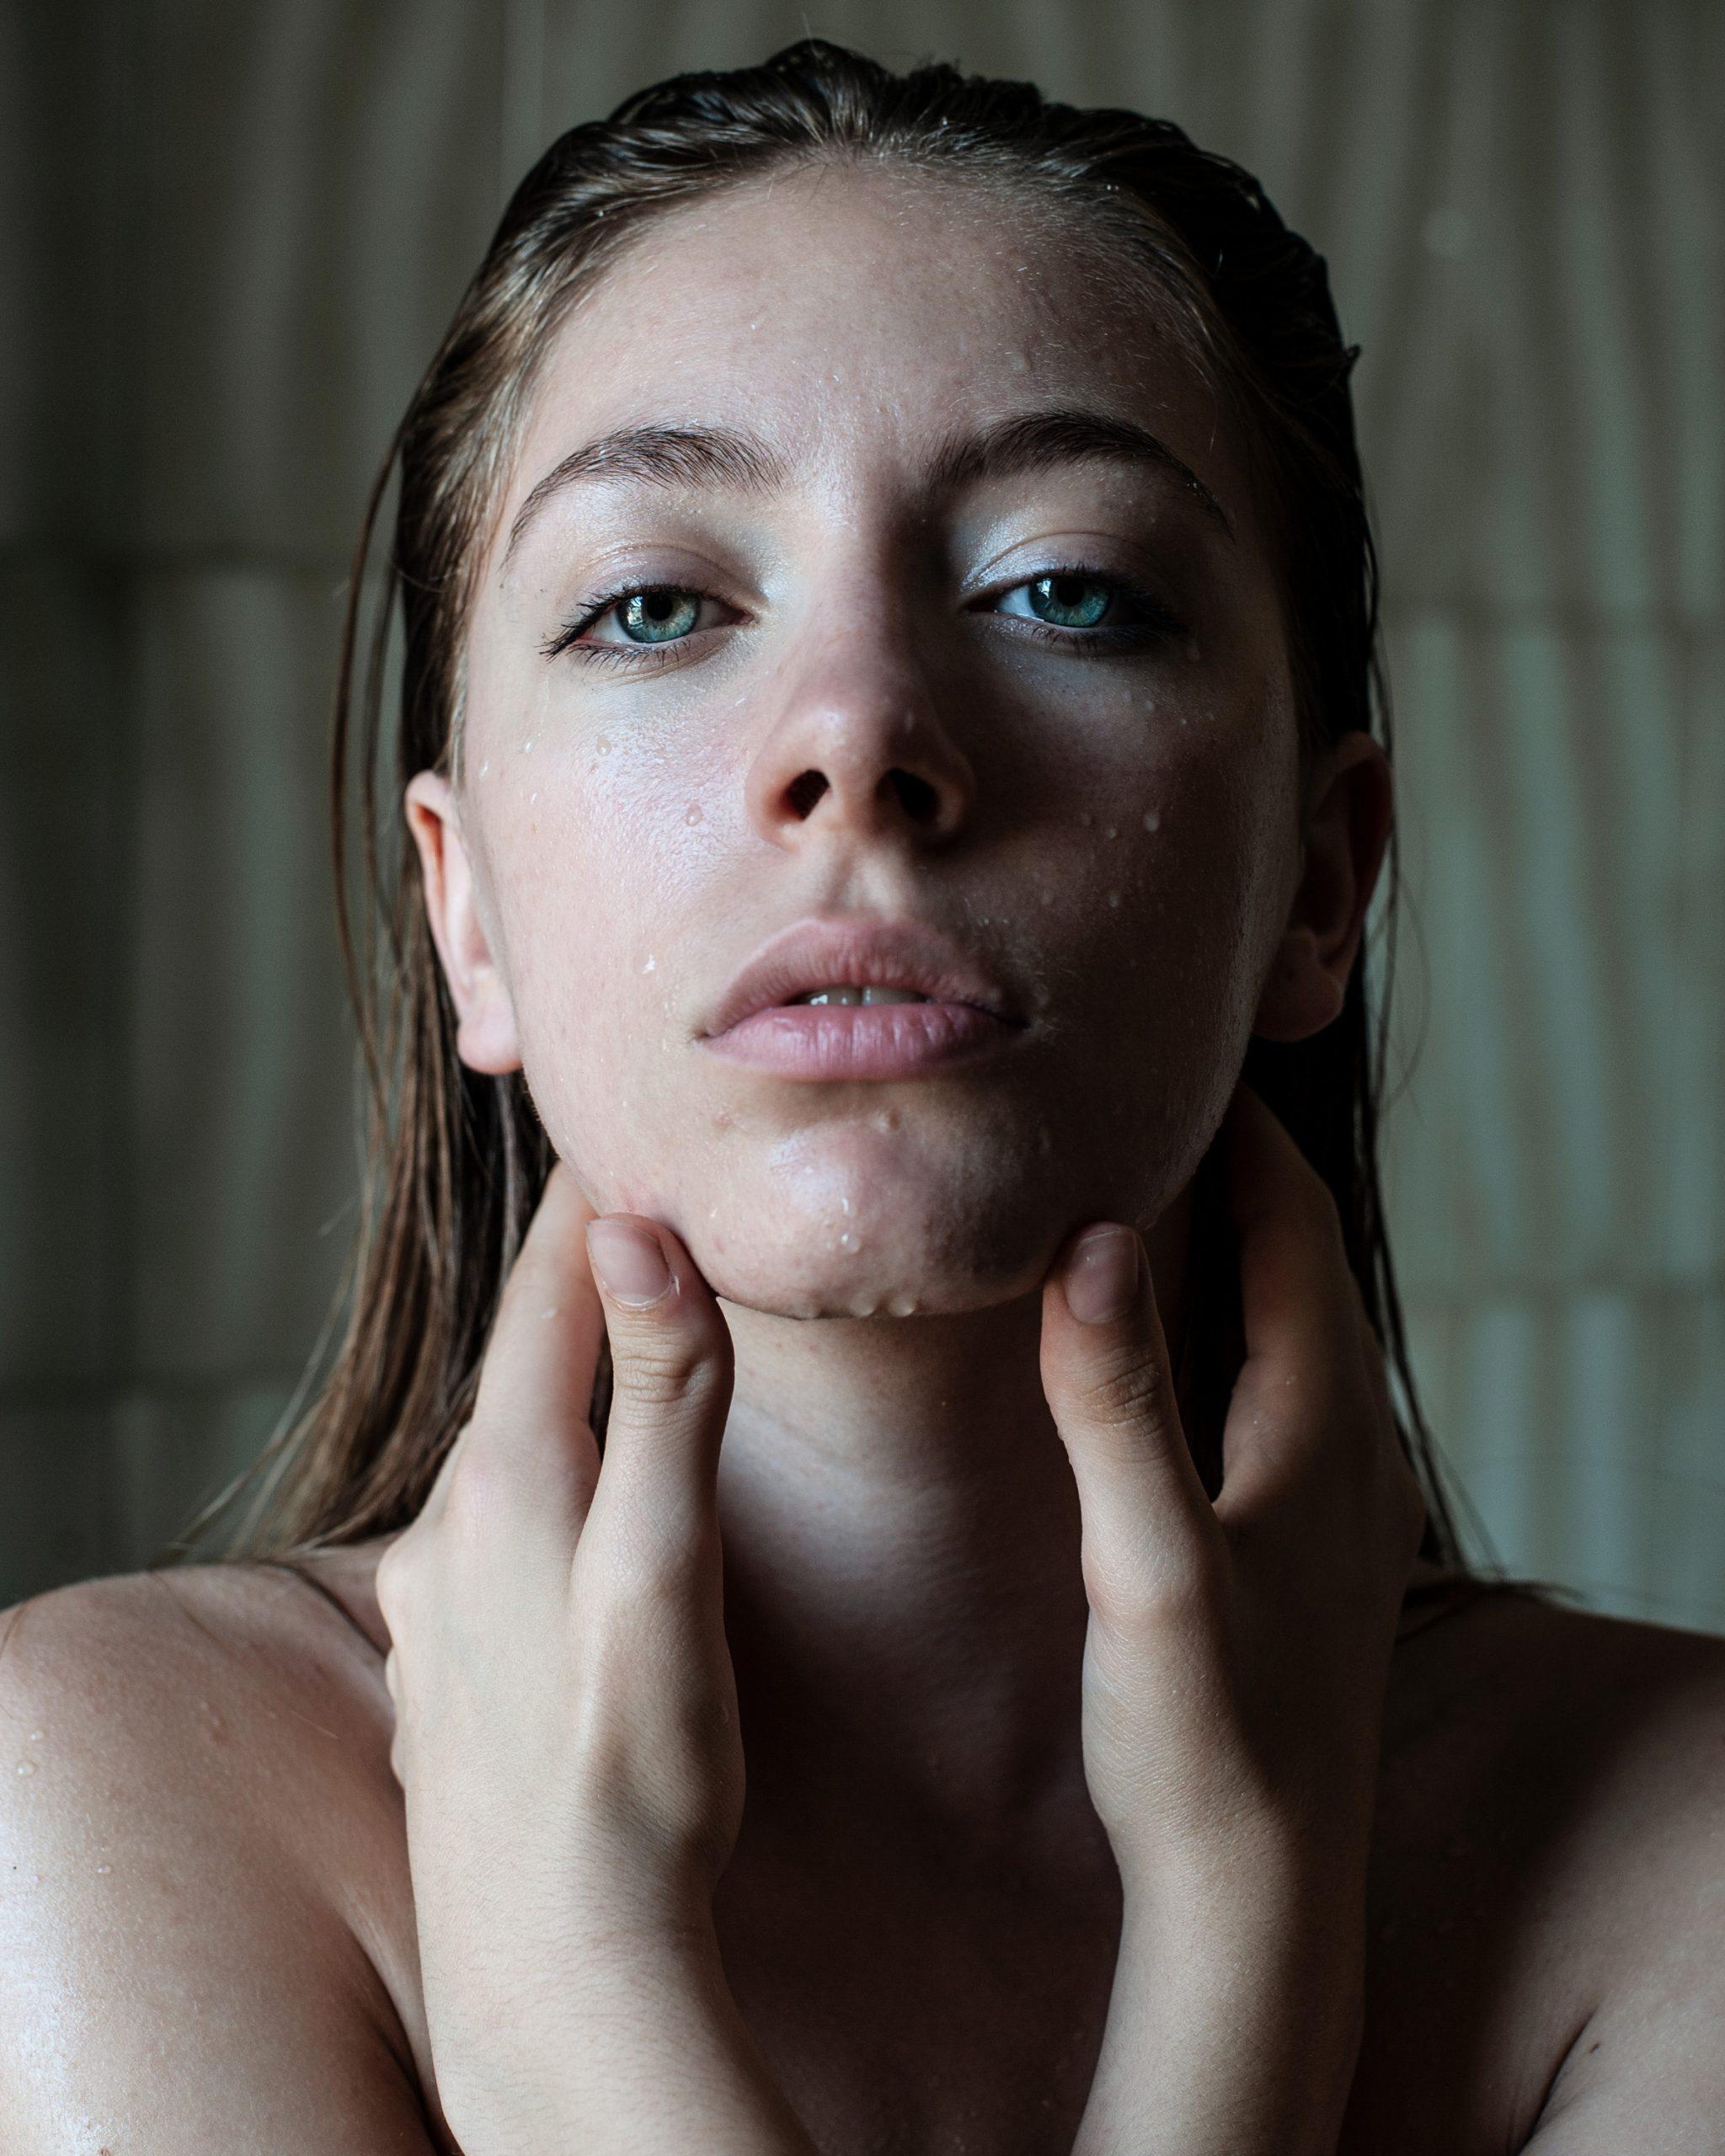 Categorie: Glamour, Portrait - Photographer: SAMUELE RIPANI - Model: IRENE MACCHIATI - Location: Martinsicuro, TE, Italia